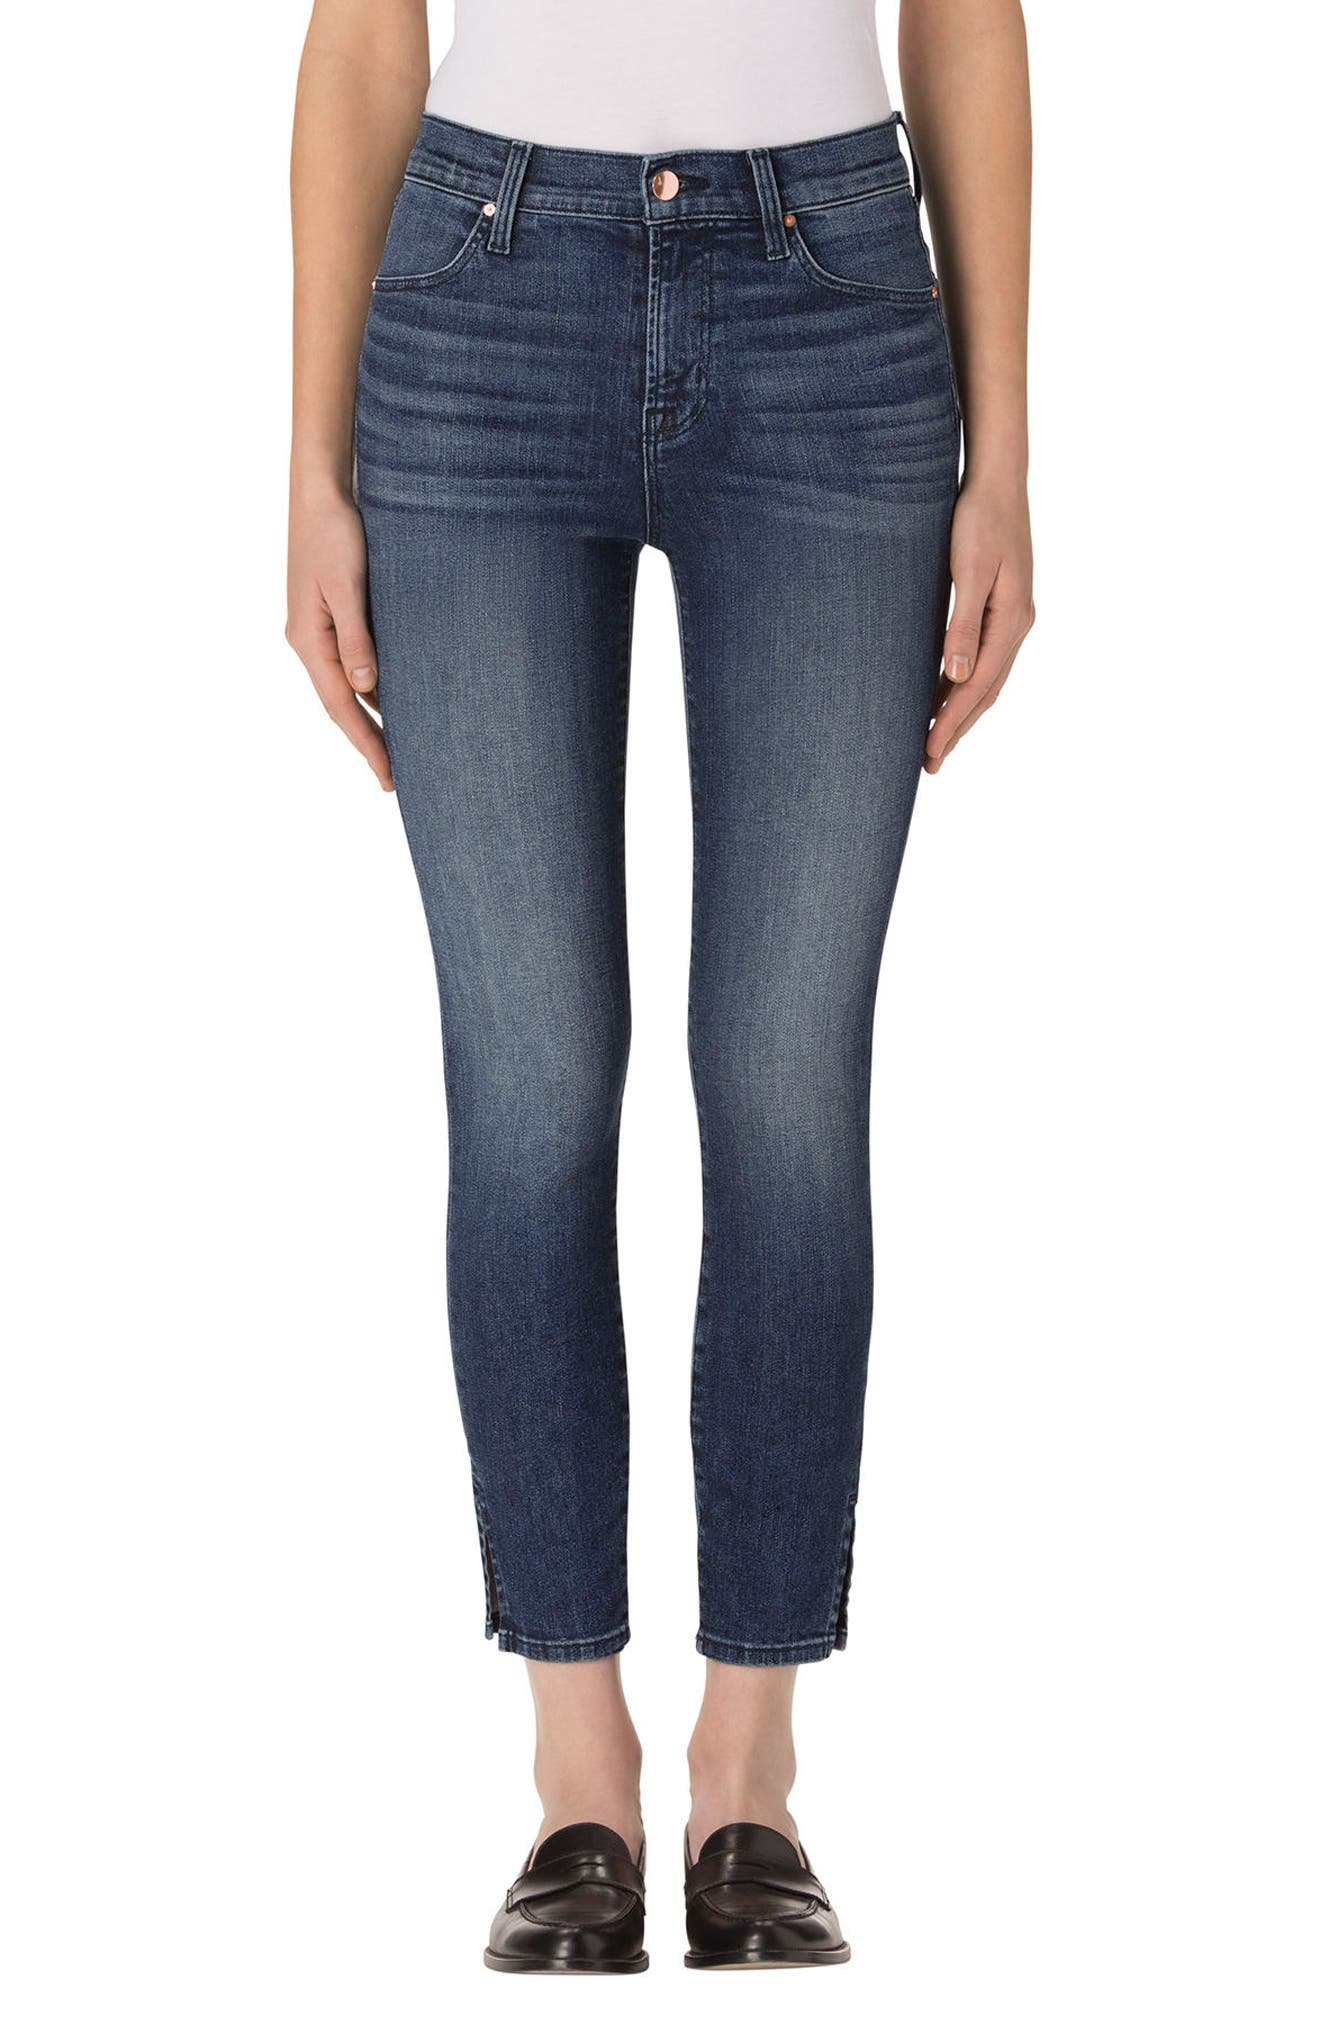 Alana High Waist Crop Skinny Jeans,                             Main thumbnail 1, color,                             403